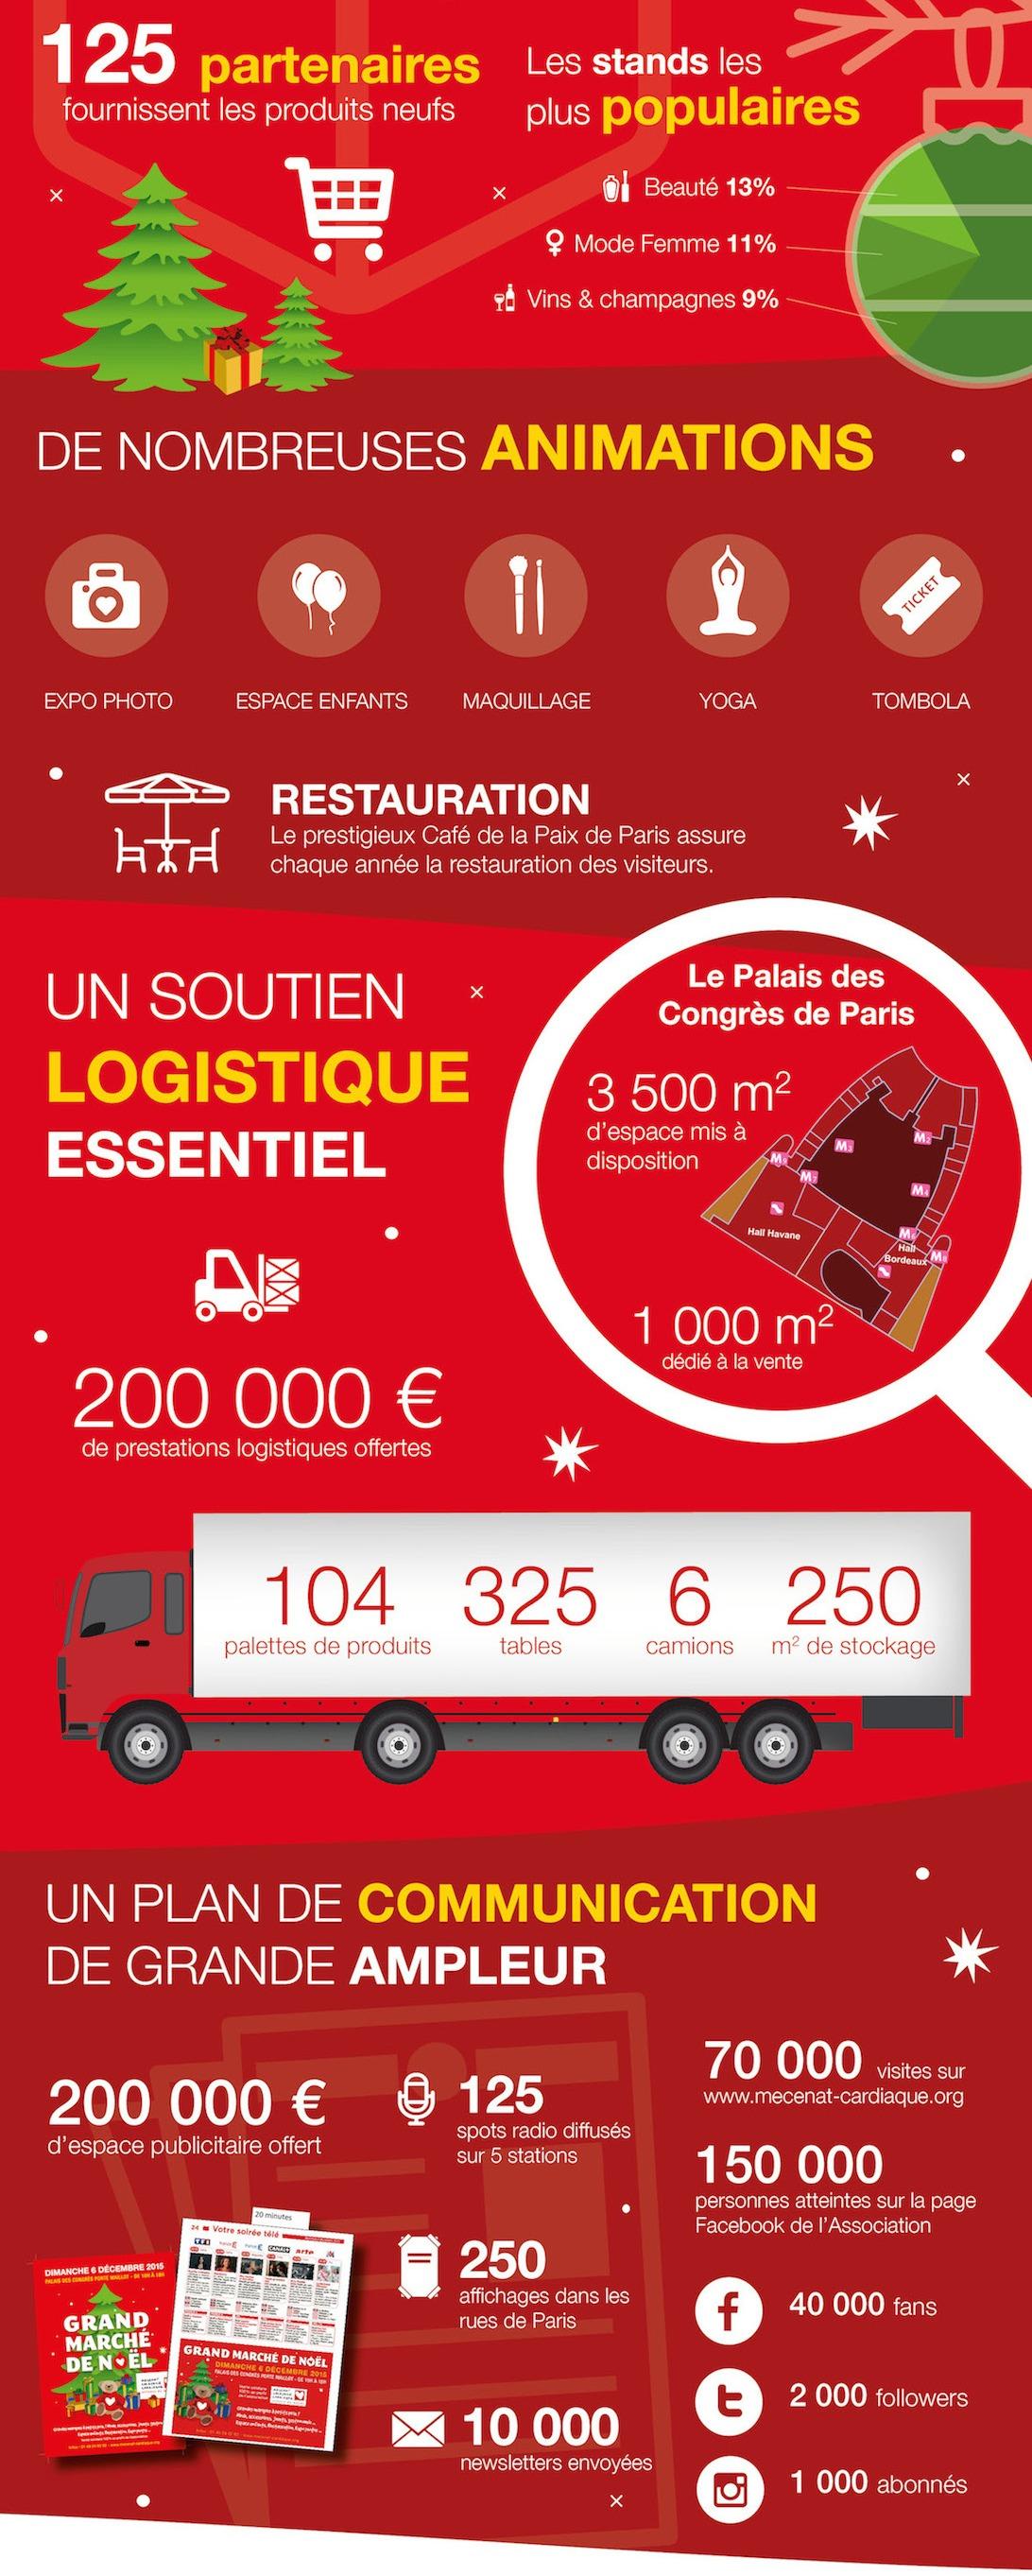 2 Résultats Marché de Noël 2015 & Visoanska